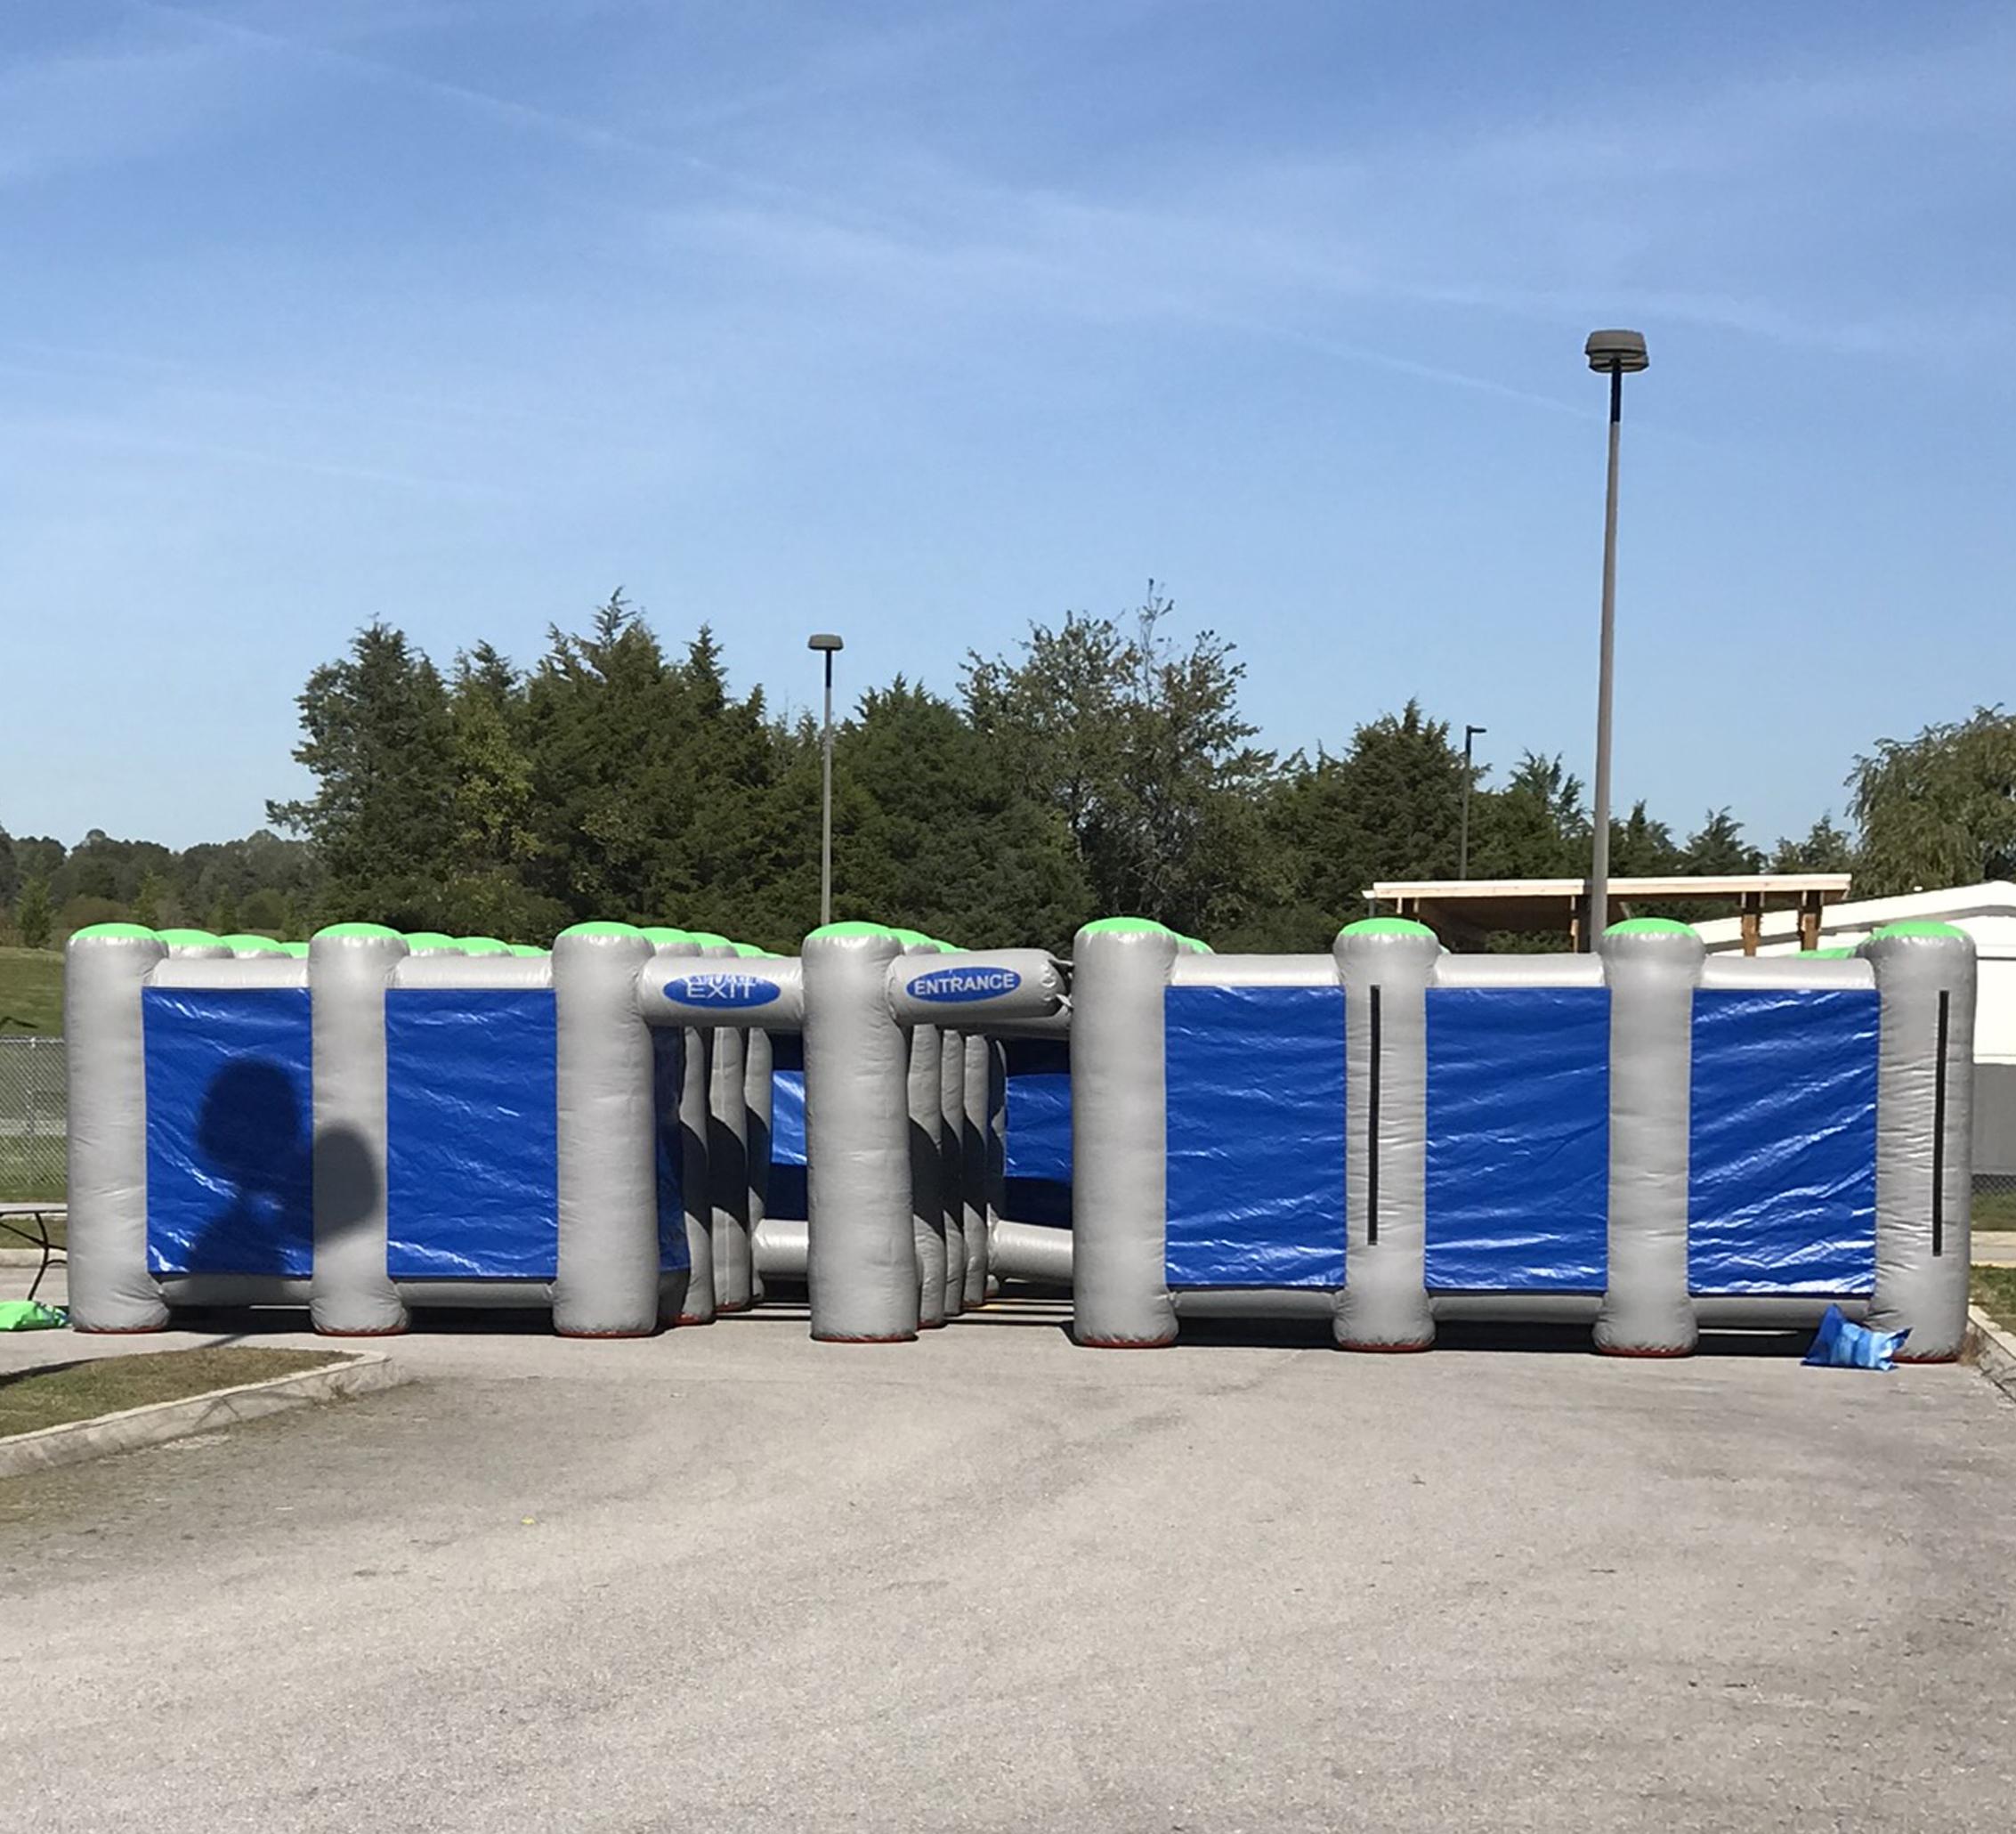 inflatable maze rental chattanooga tn